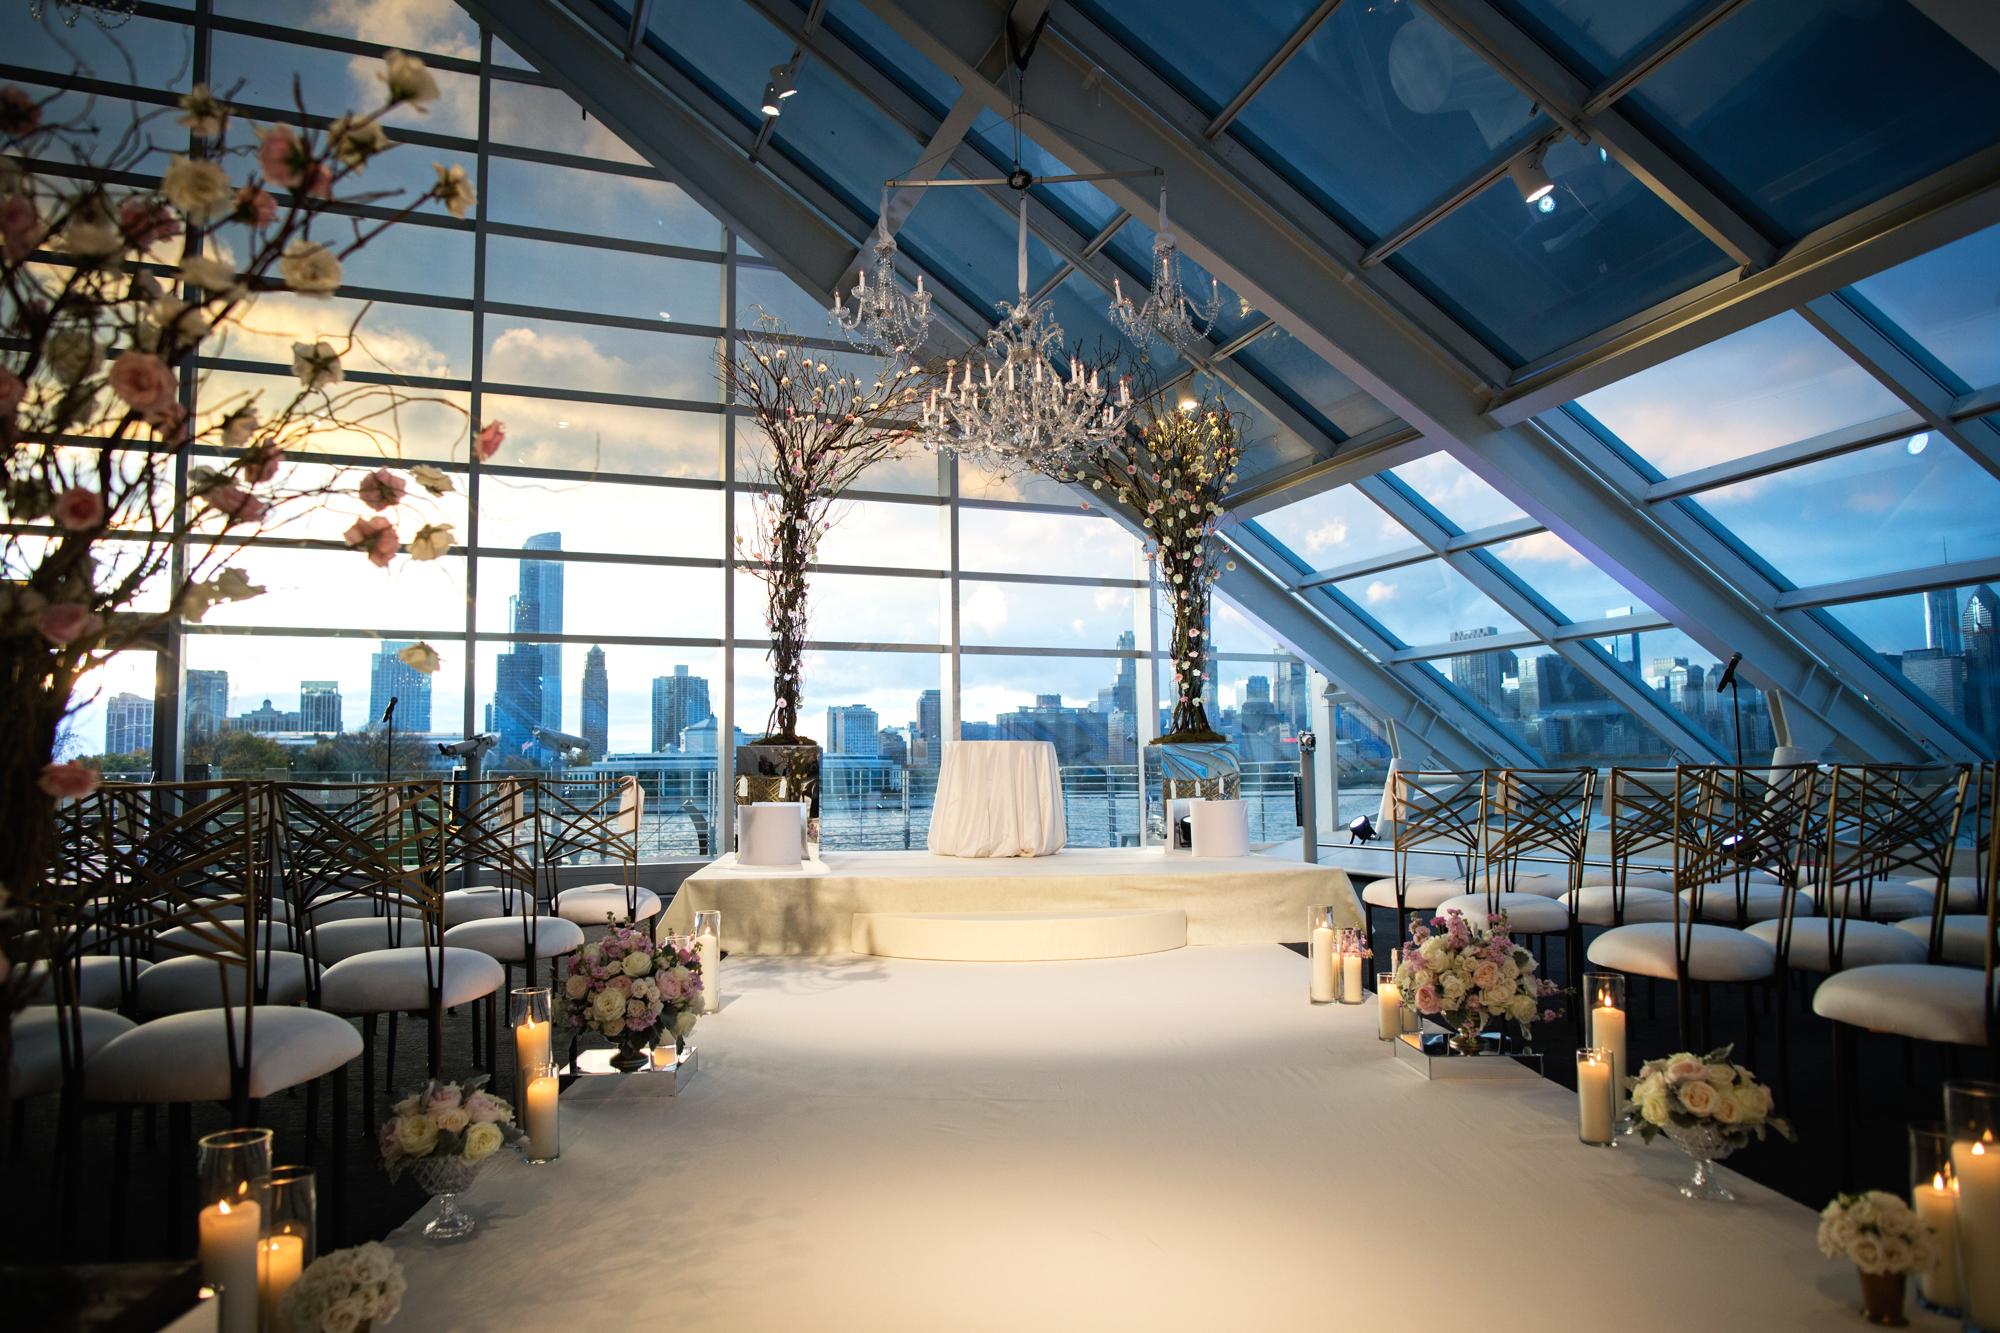 Chicago skyline sets the backdrop for an exquisite Adler Planetarium wedding ceremony.